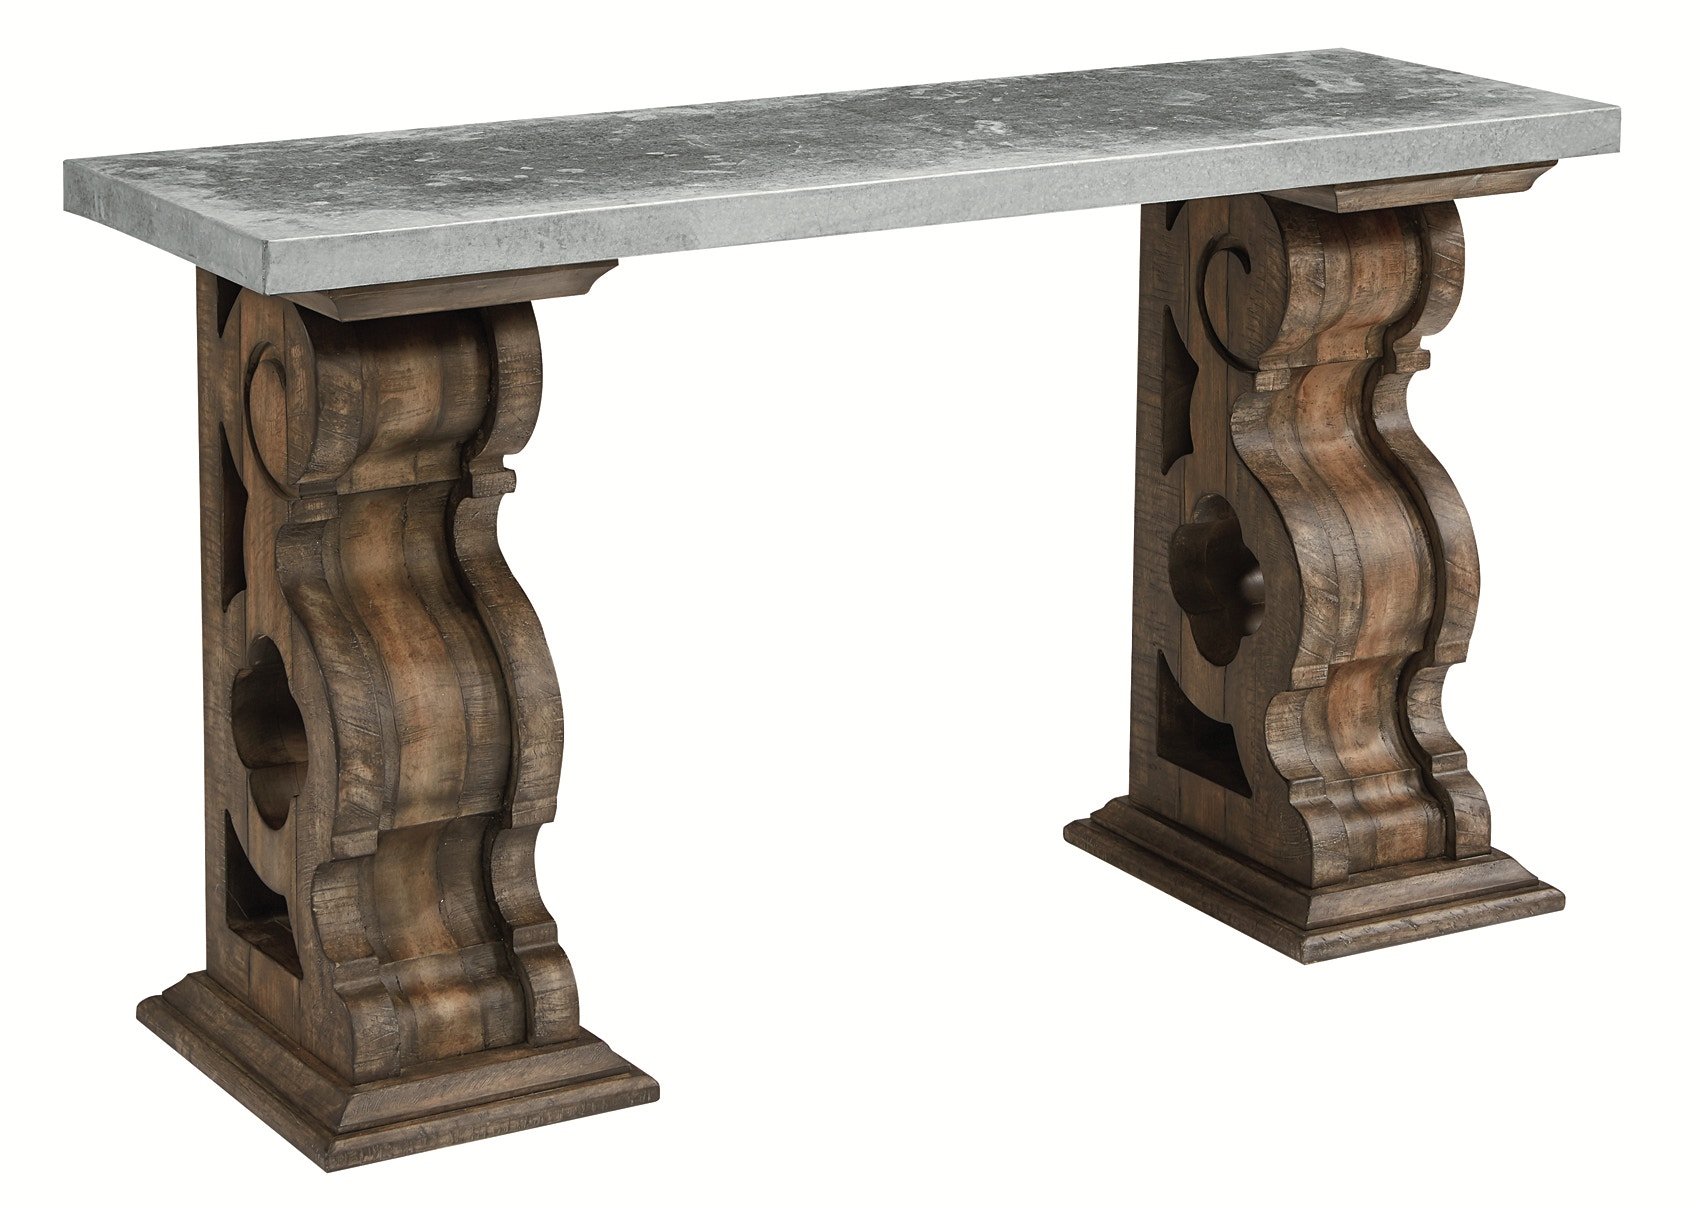 Magnolia home living room double pedestal console table 052002 magnolia home double pedestal console table 052002 geotapseo Choice Image